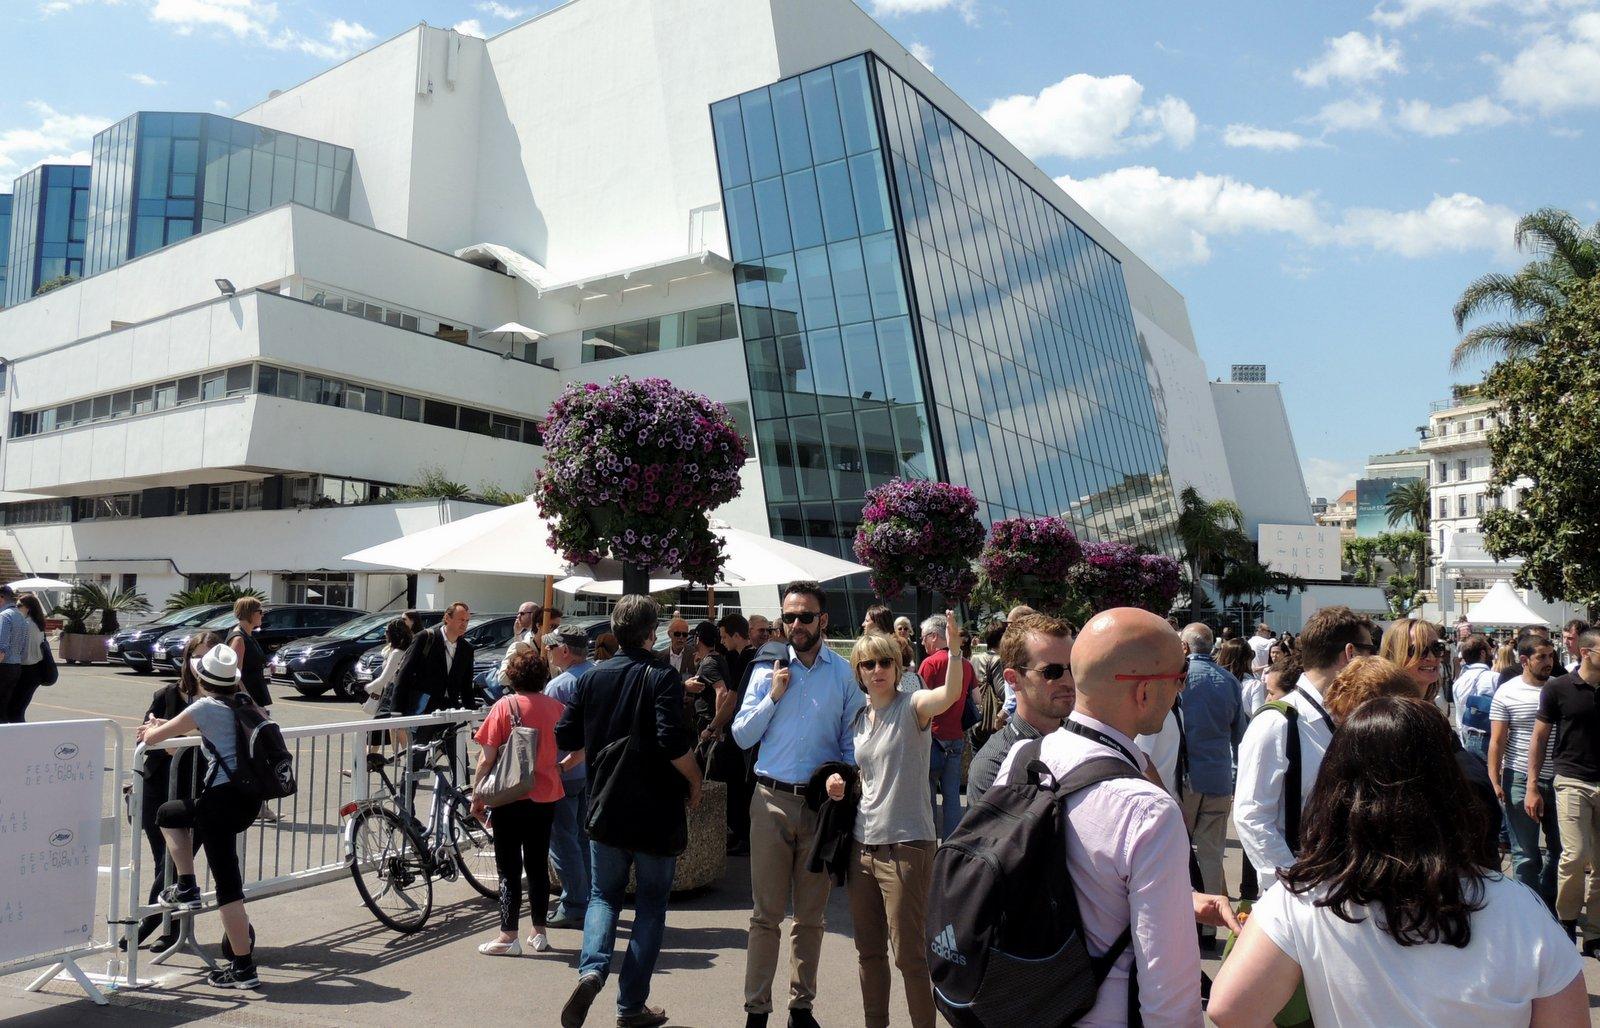 Filmfestspiele in Cannes - Côte d`Azur